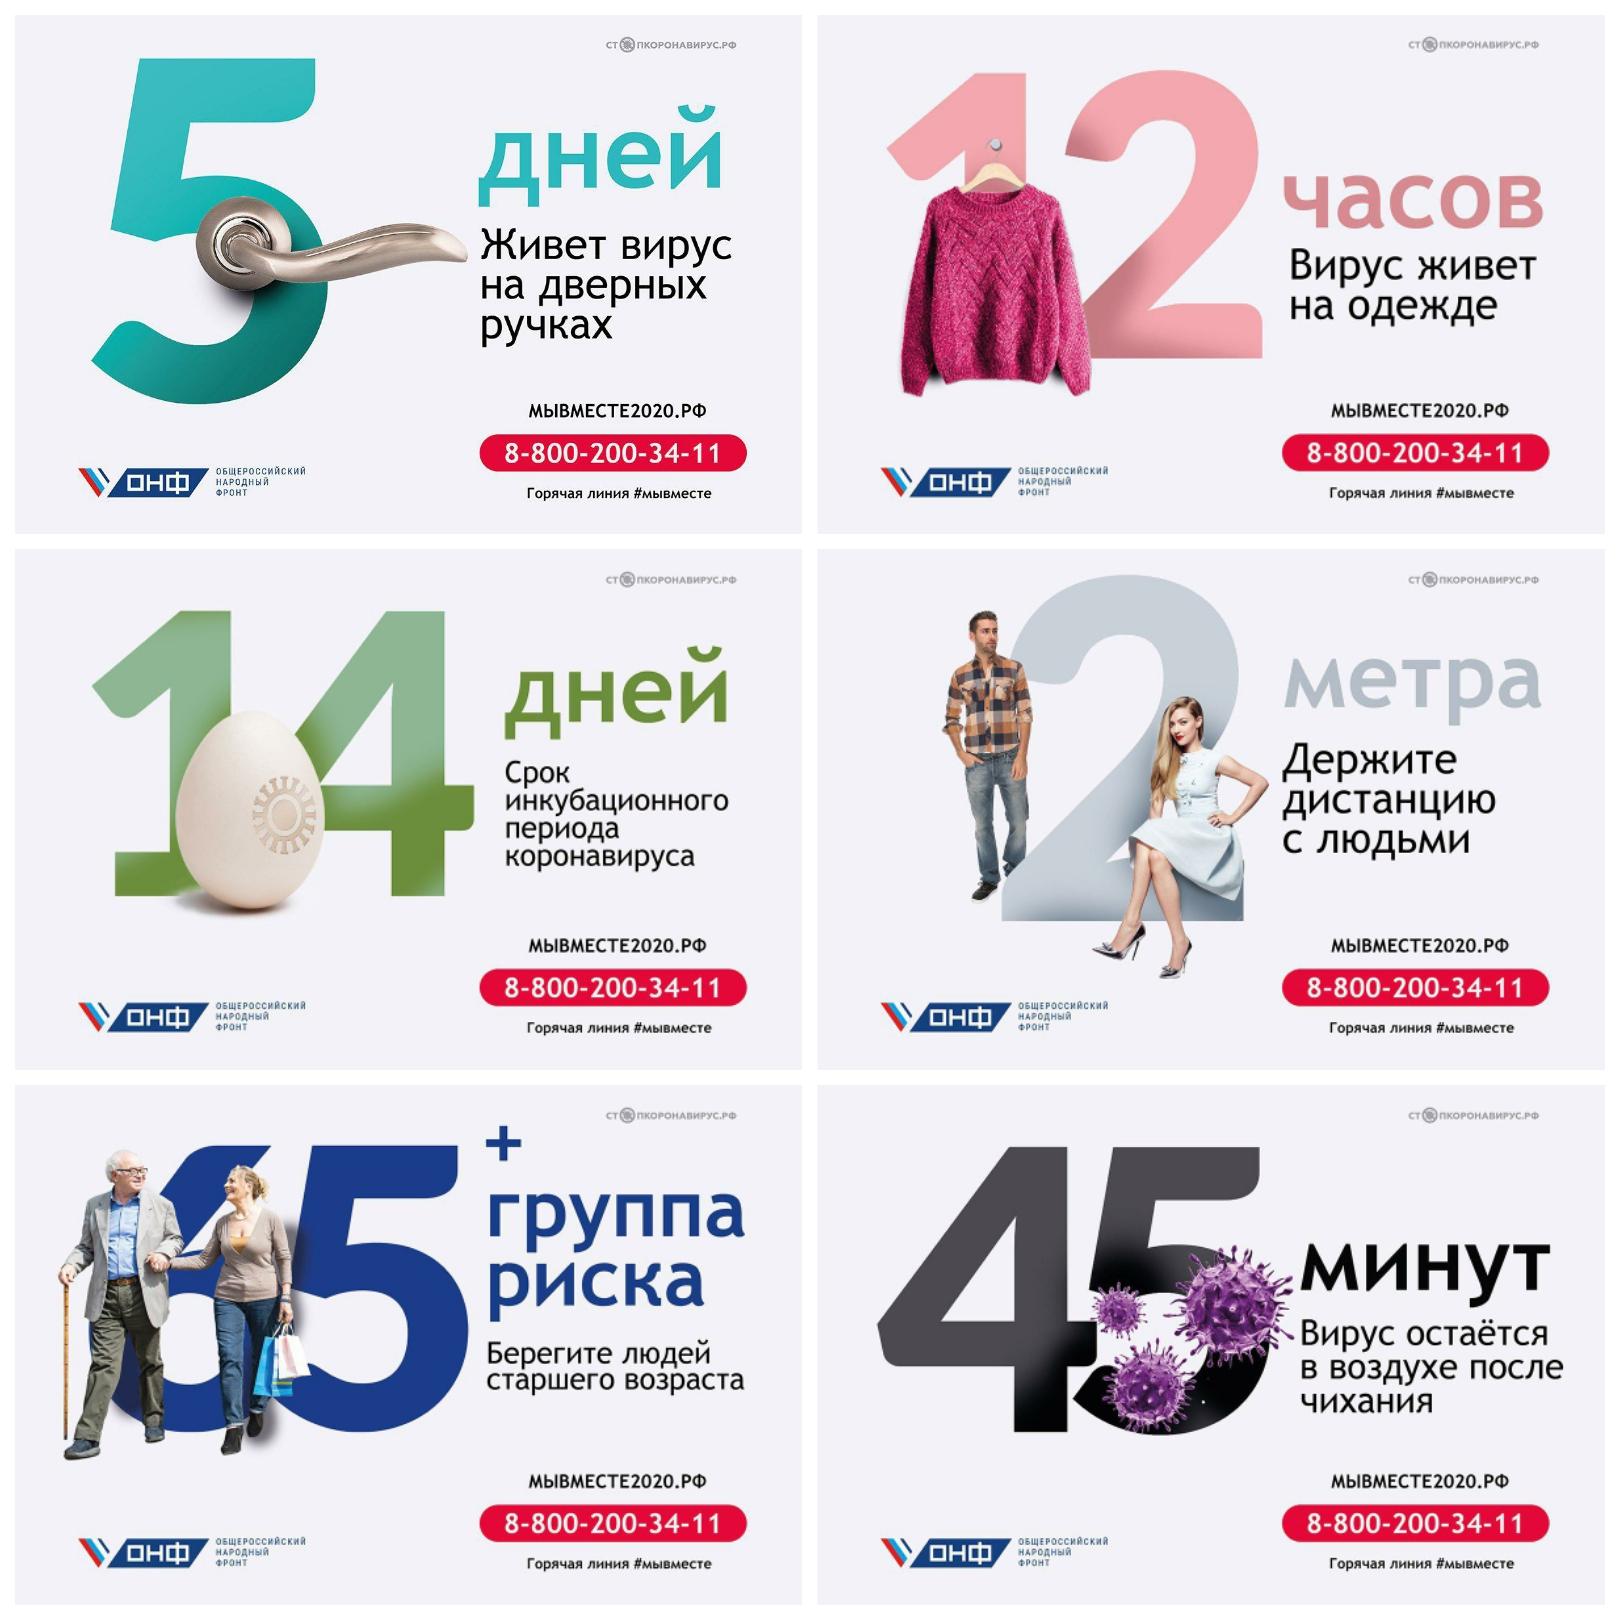 koronavirus_pamjatka